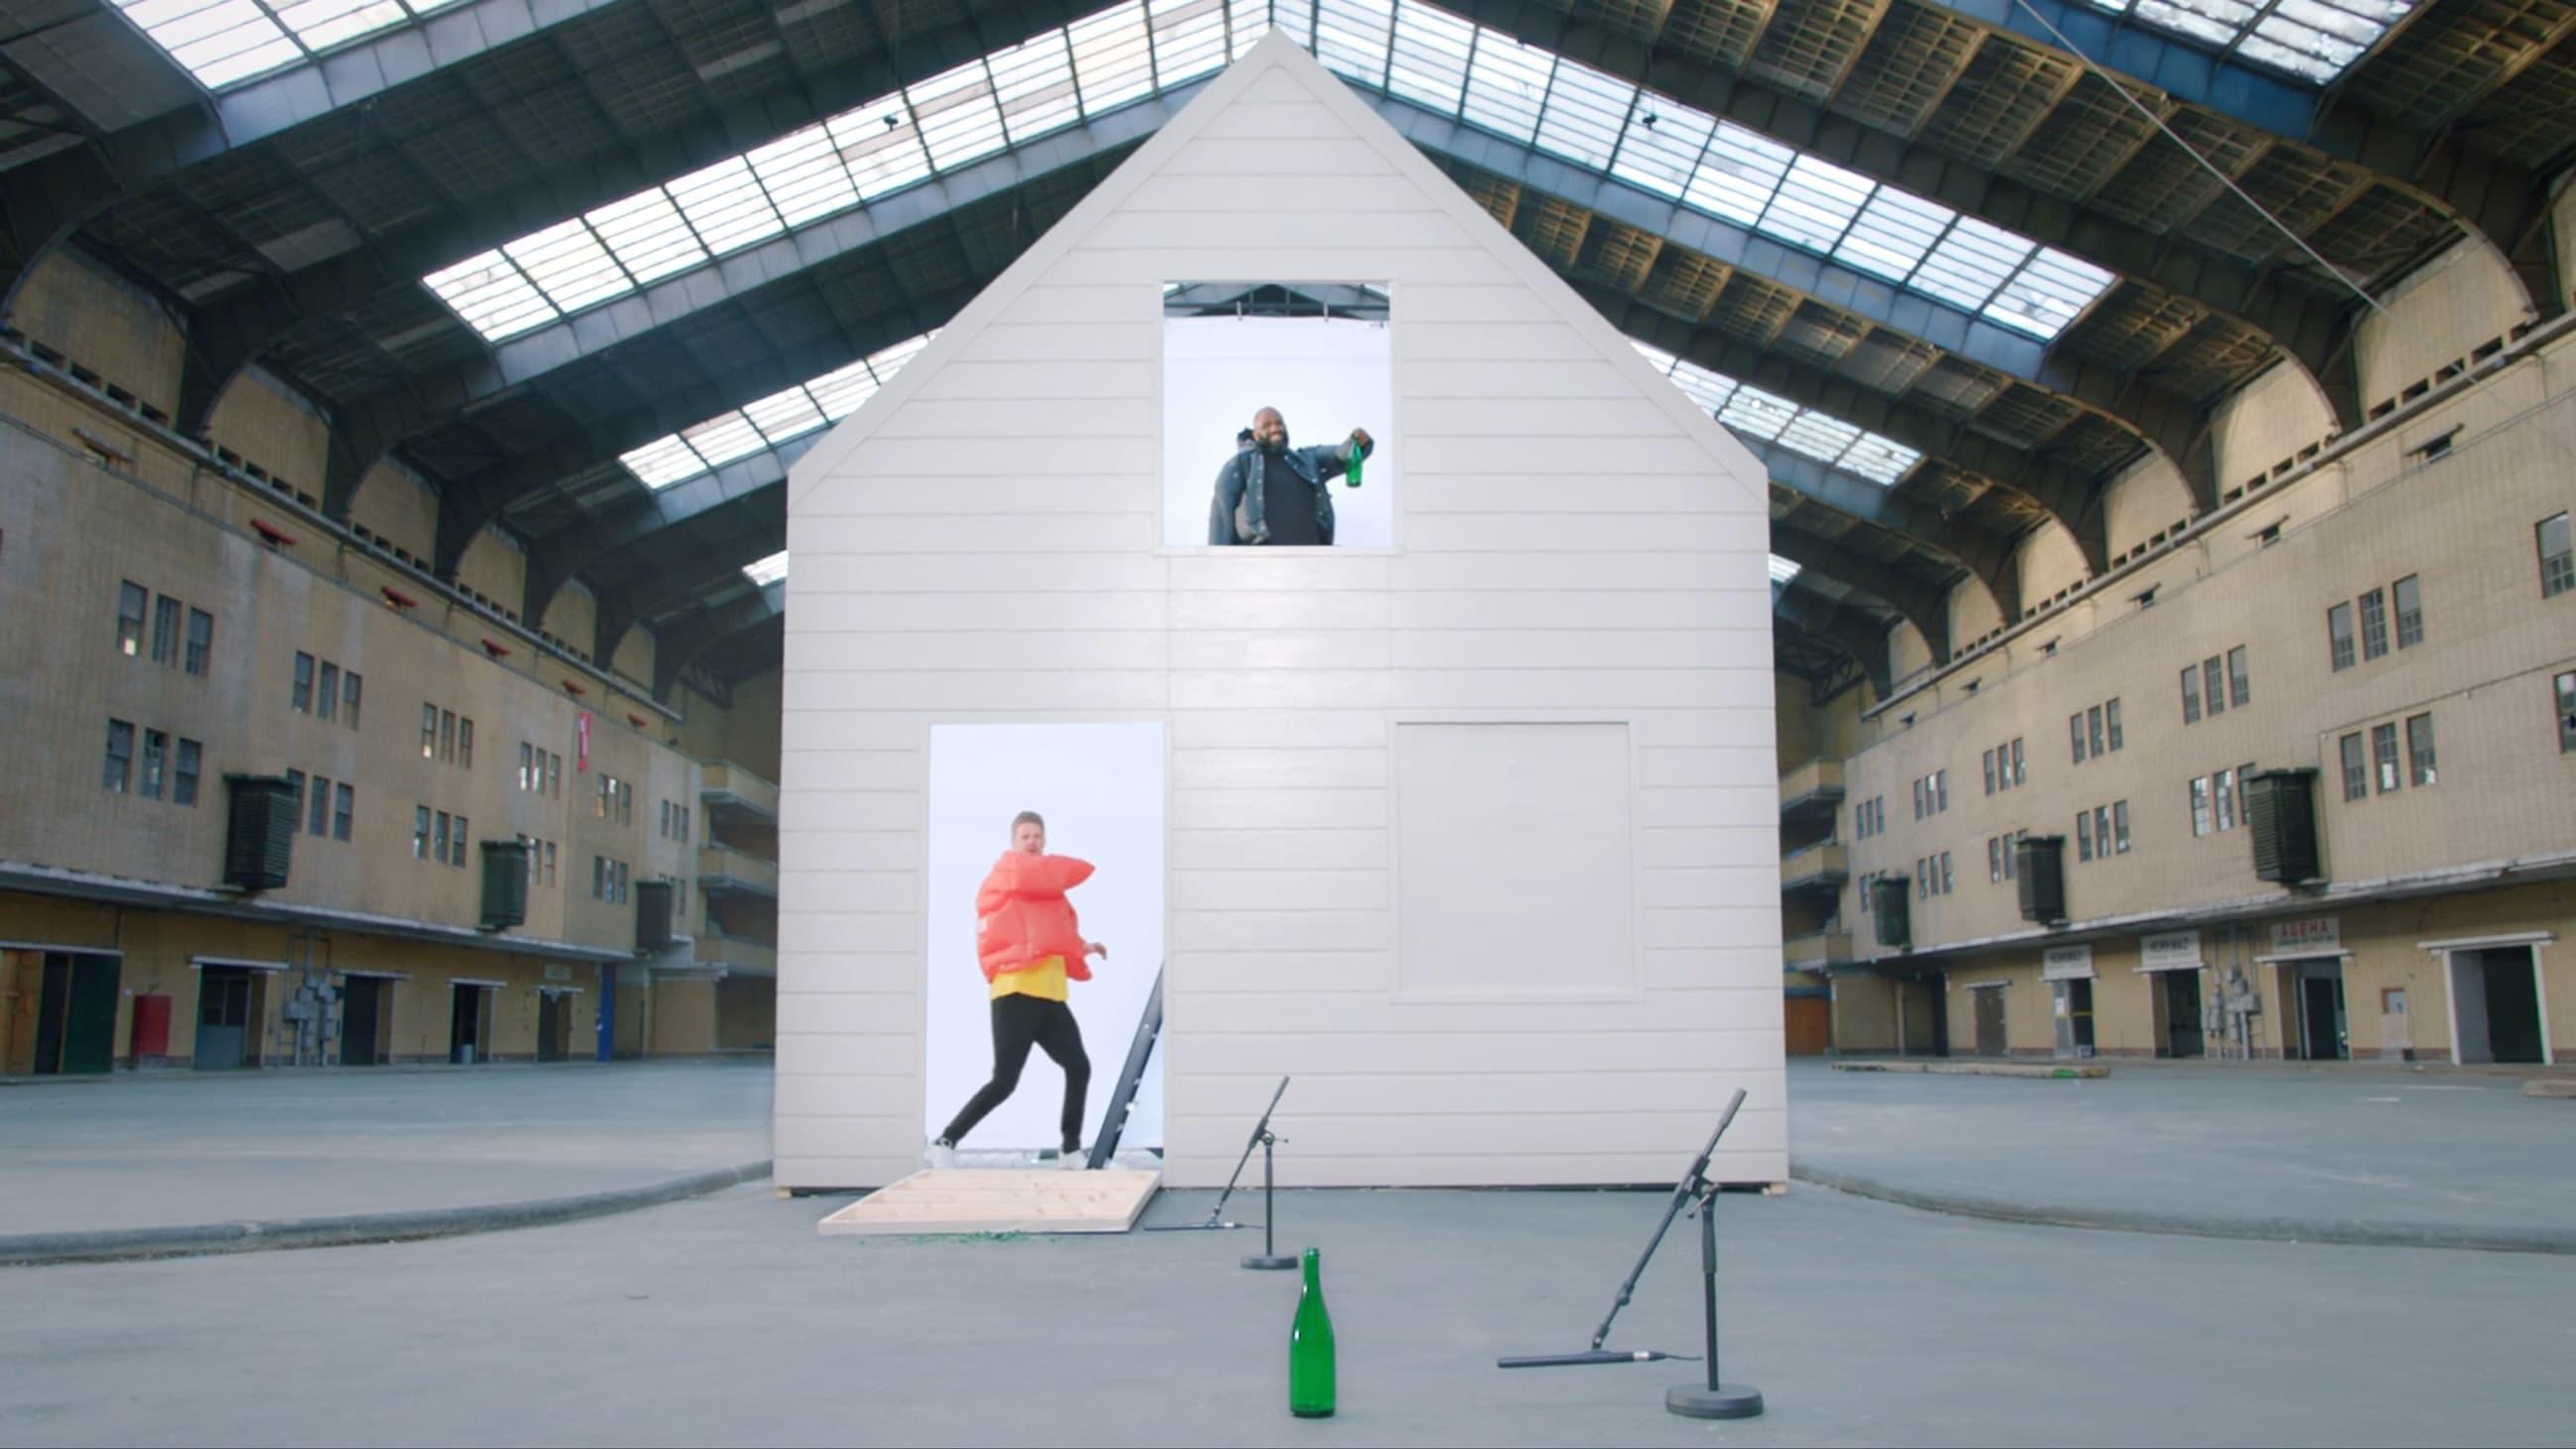 Studio Sander Plug – De Jeugd Van Tegenwoordig - Glasbak